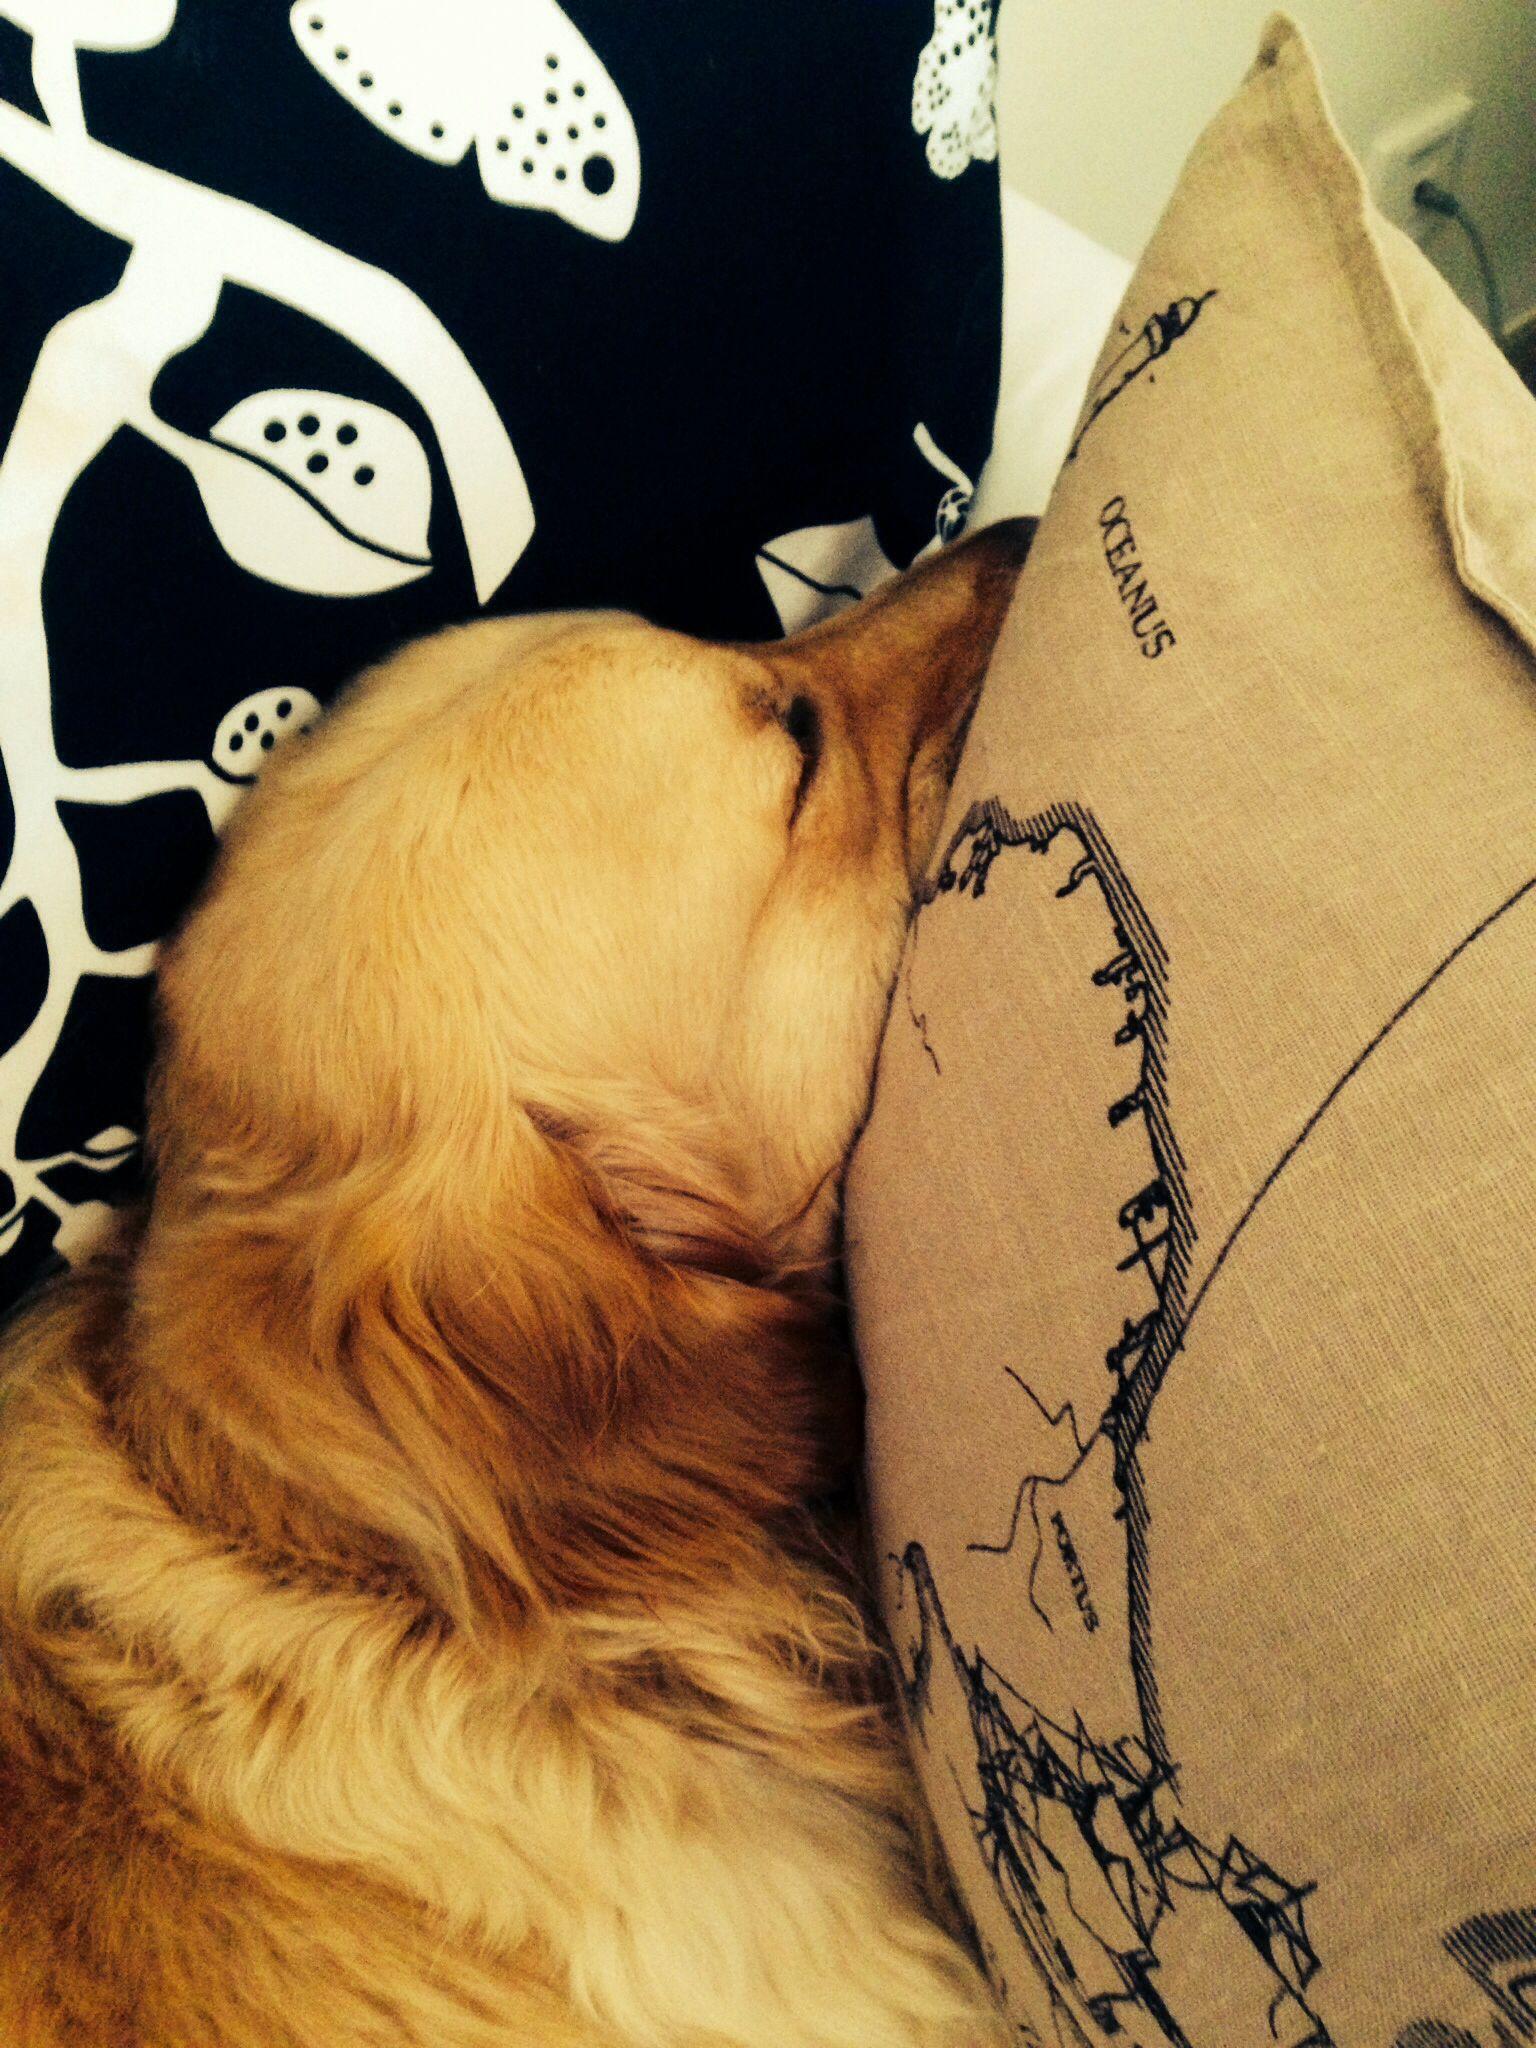 That's how I cozy up#caesar